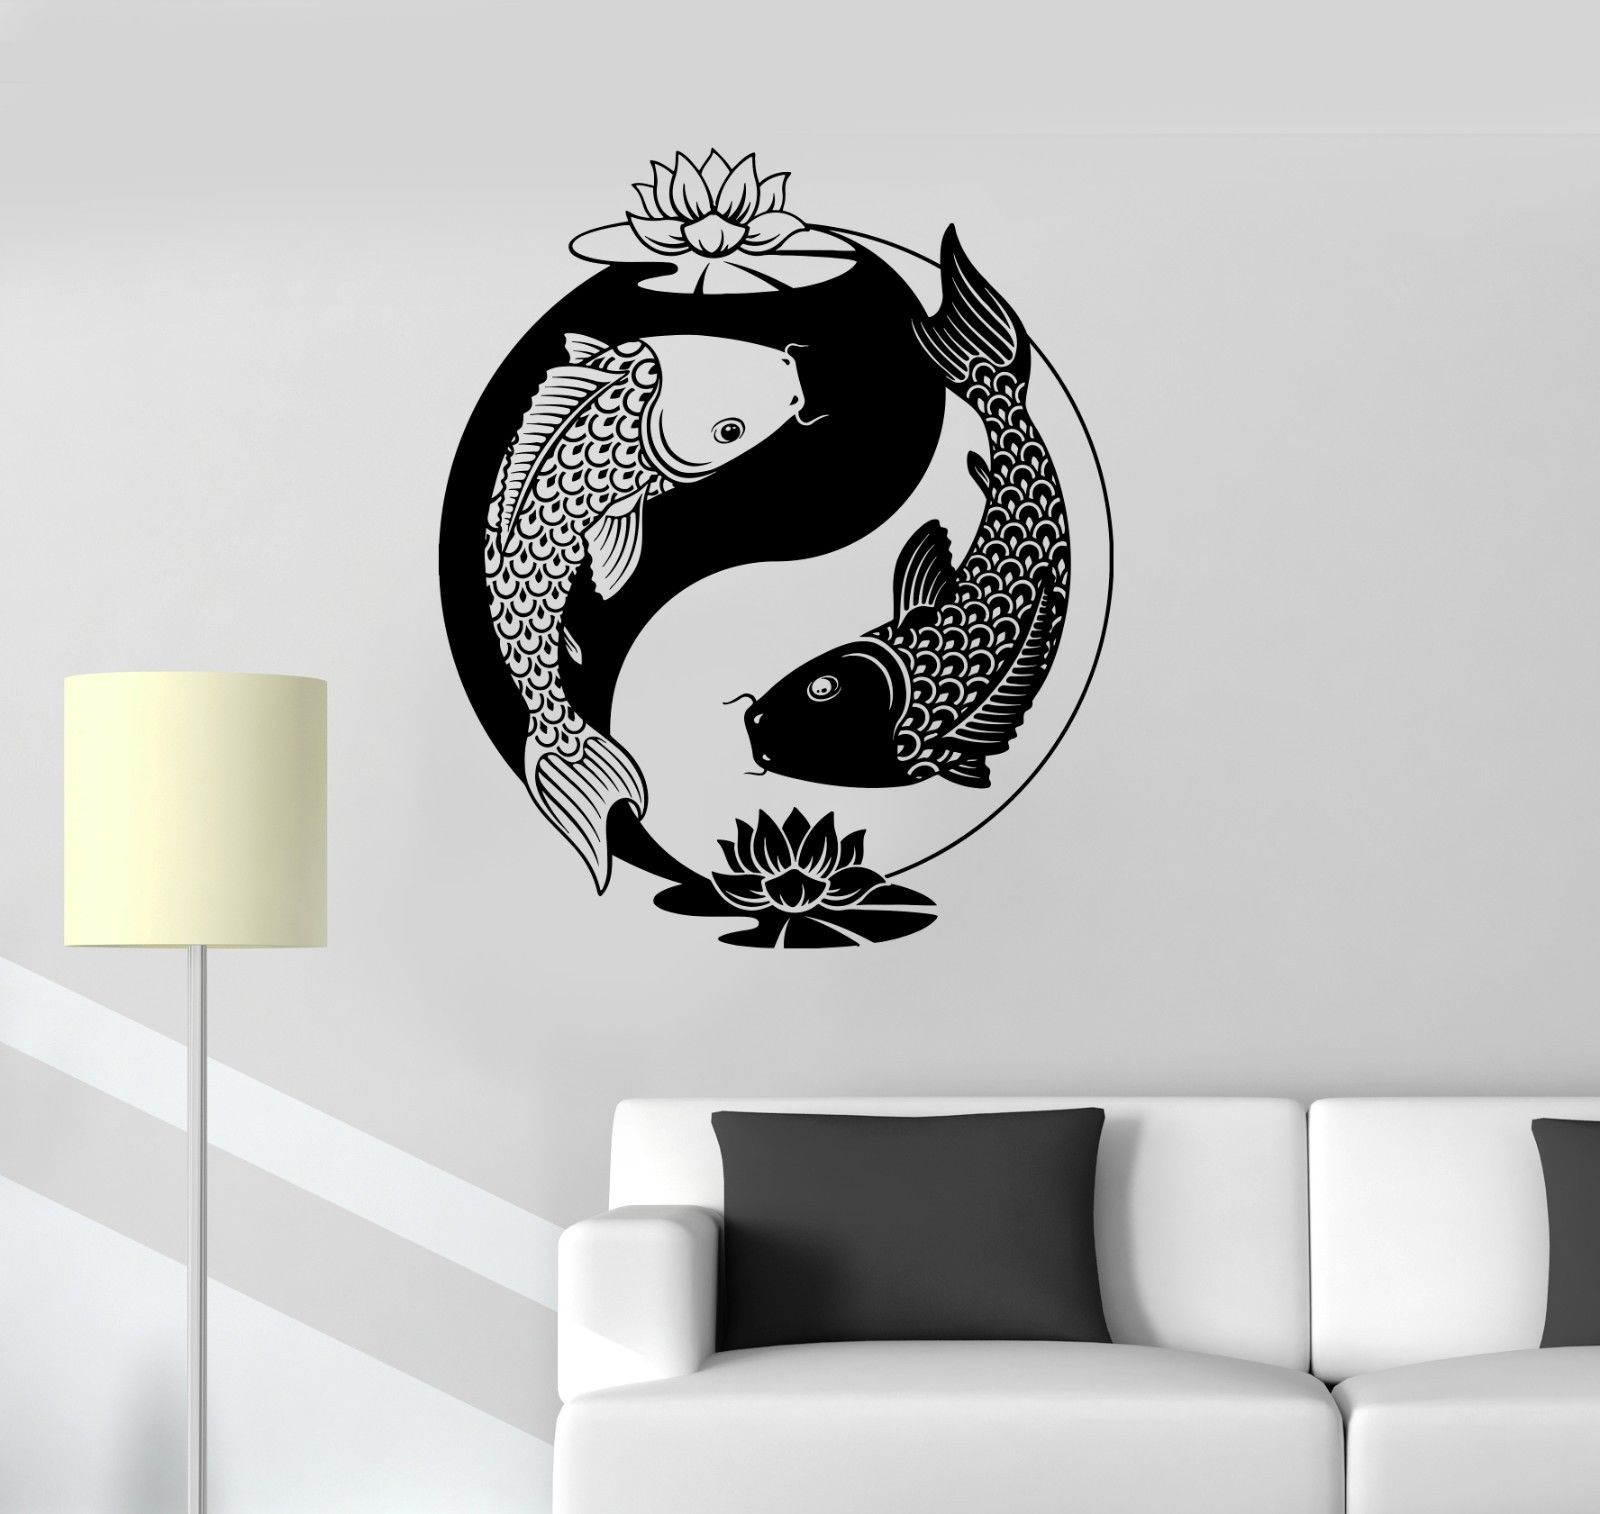 Yin Yang Tai loto chino filosofía Zen peces vinilo pared pegatina etiqueta envío gratuito